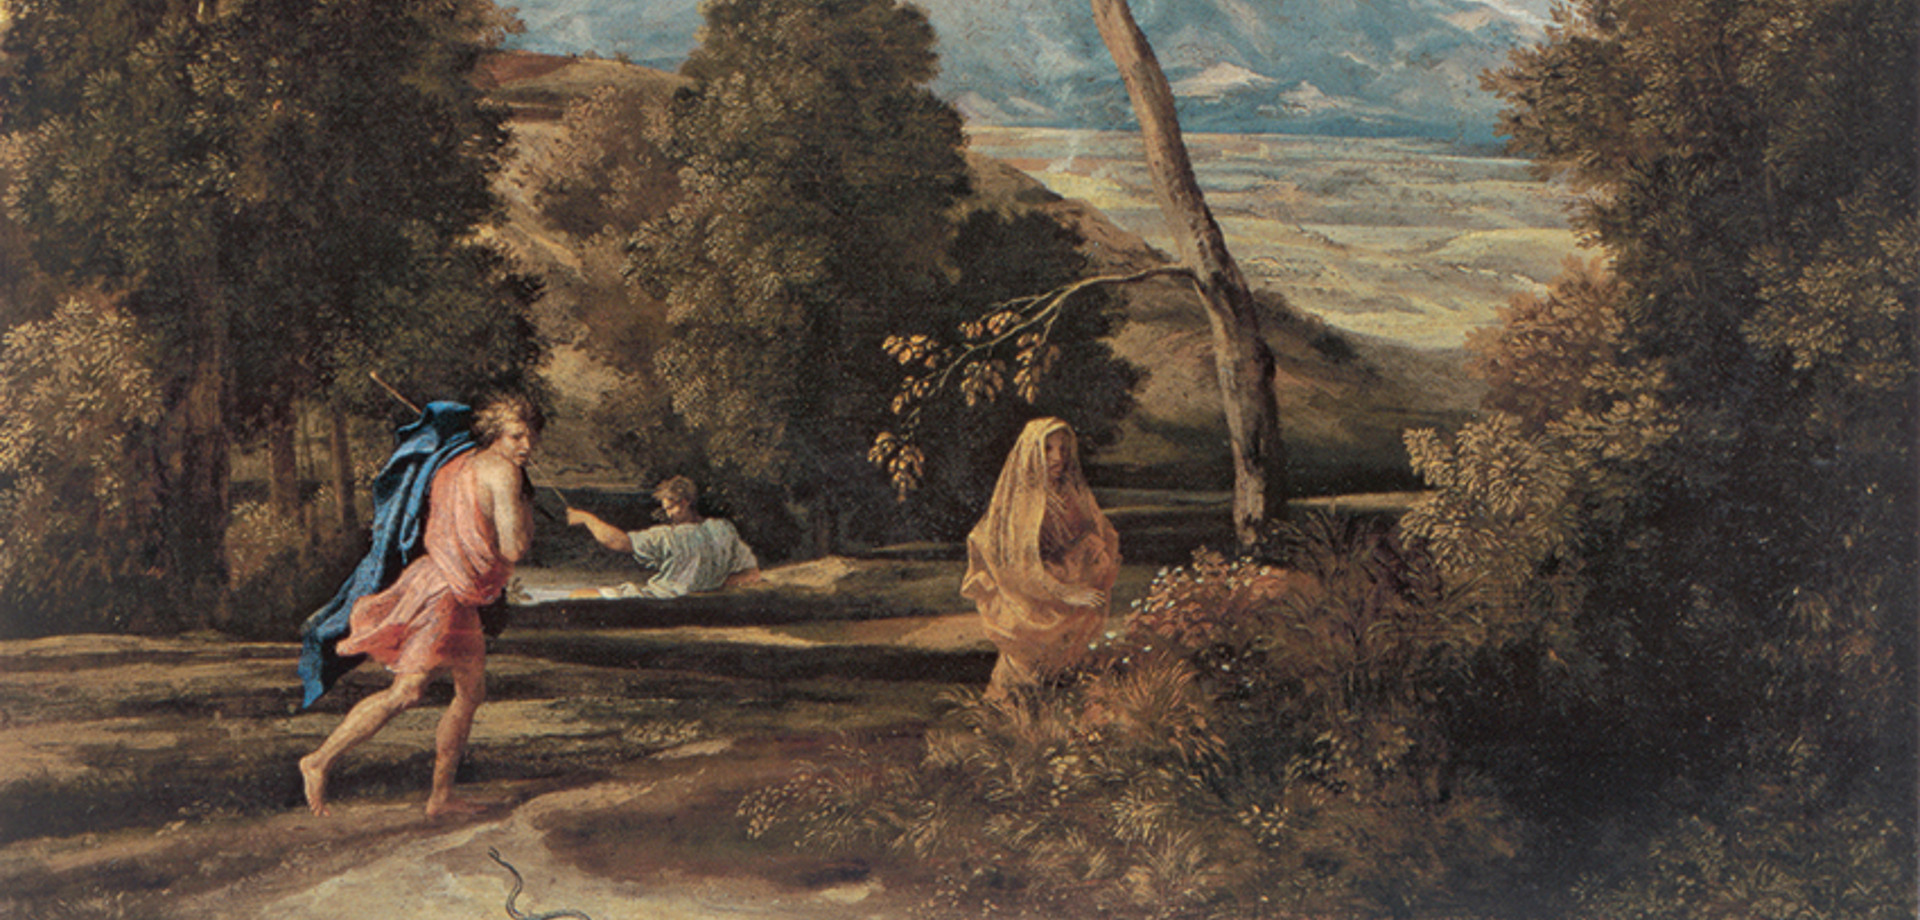 Poussin - Feldman_02: Νικολά Πουσέν «Τοπίο με Άνδρα καταδιωκόμενο από Φίδι». Λάδι σε μουσαμά, 65 x 76 εκ. The Montreal Museum of Fine Arts